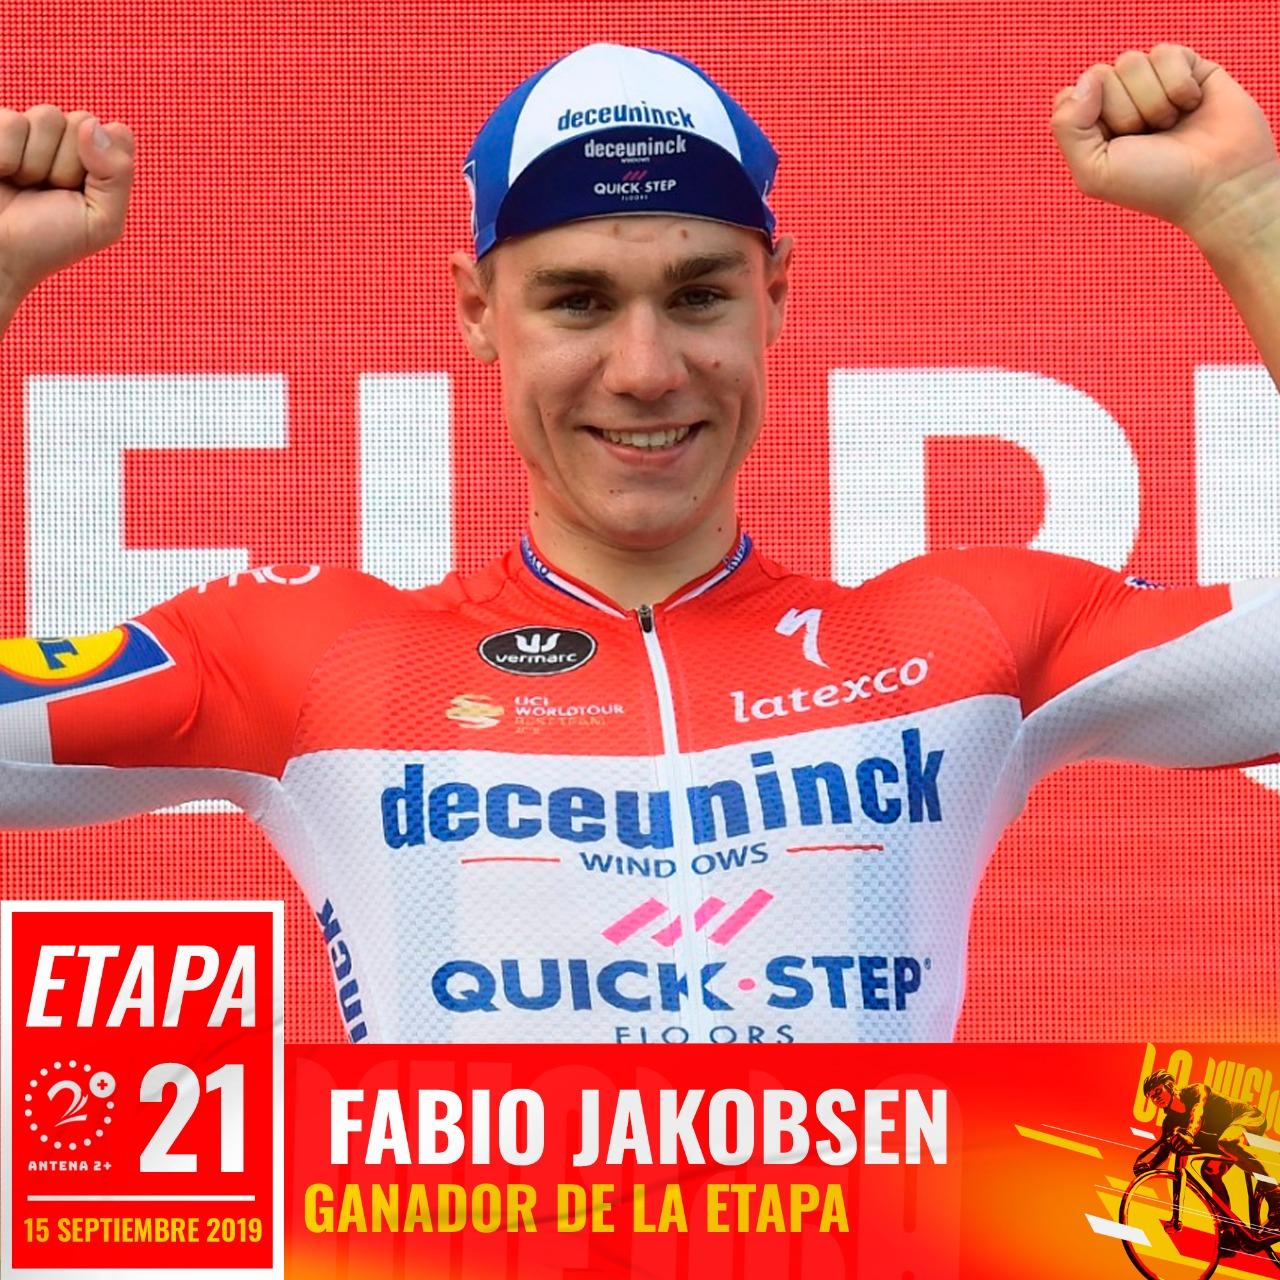 Fabio Jakobsen, etapa 21, Vuelta a España